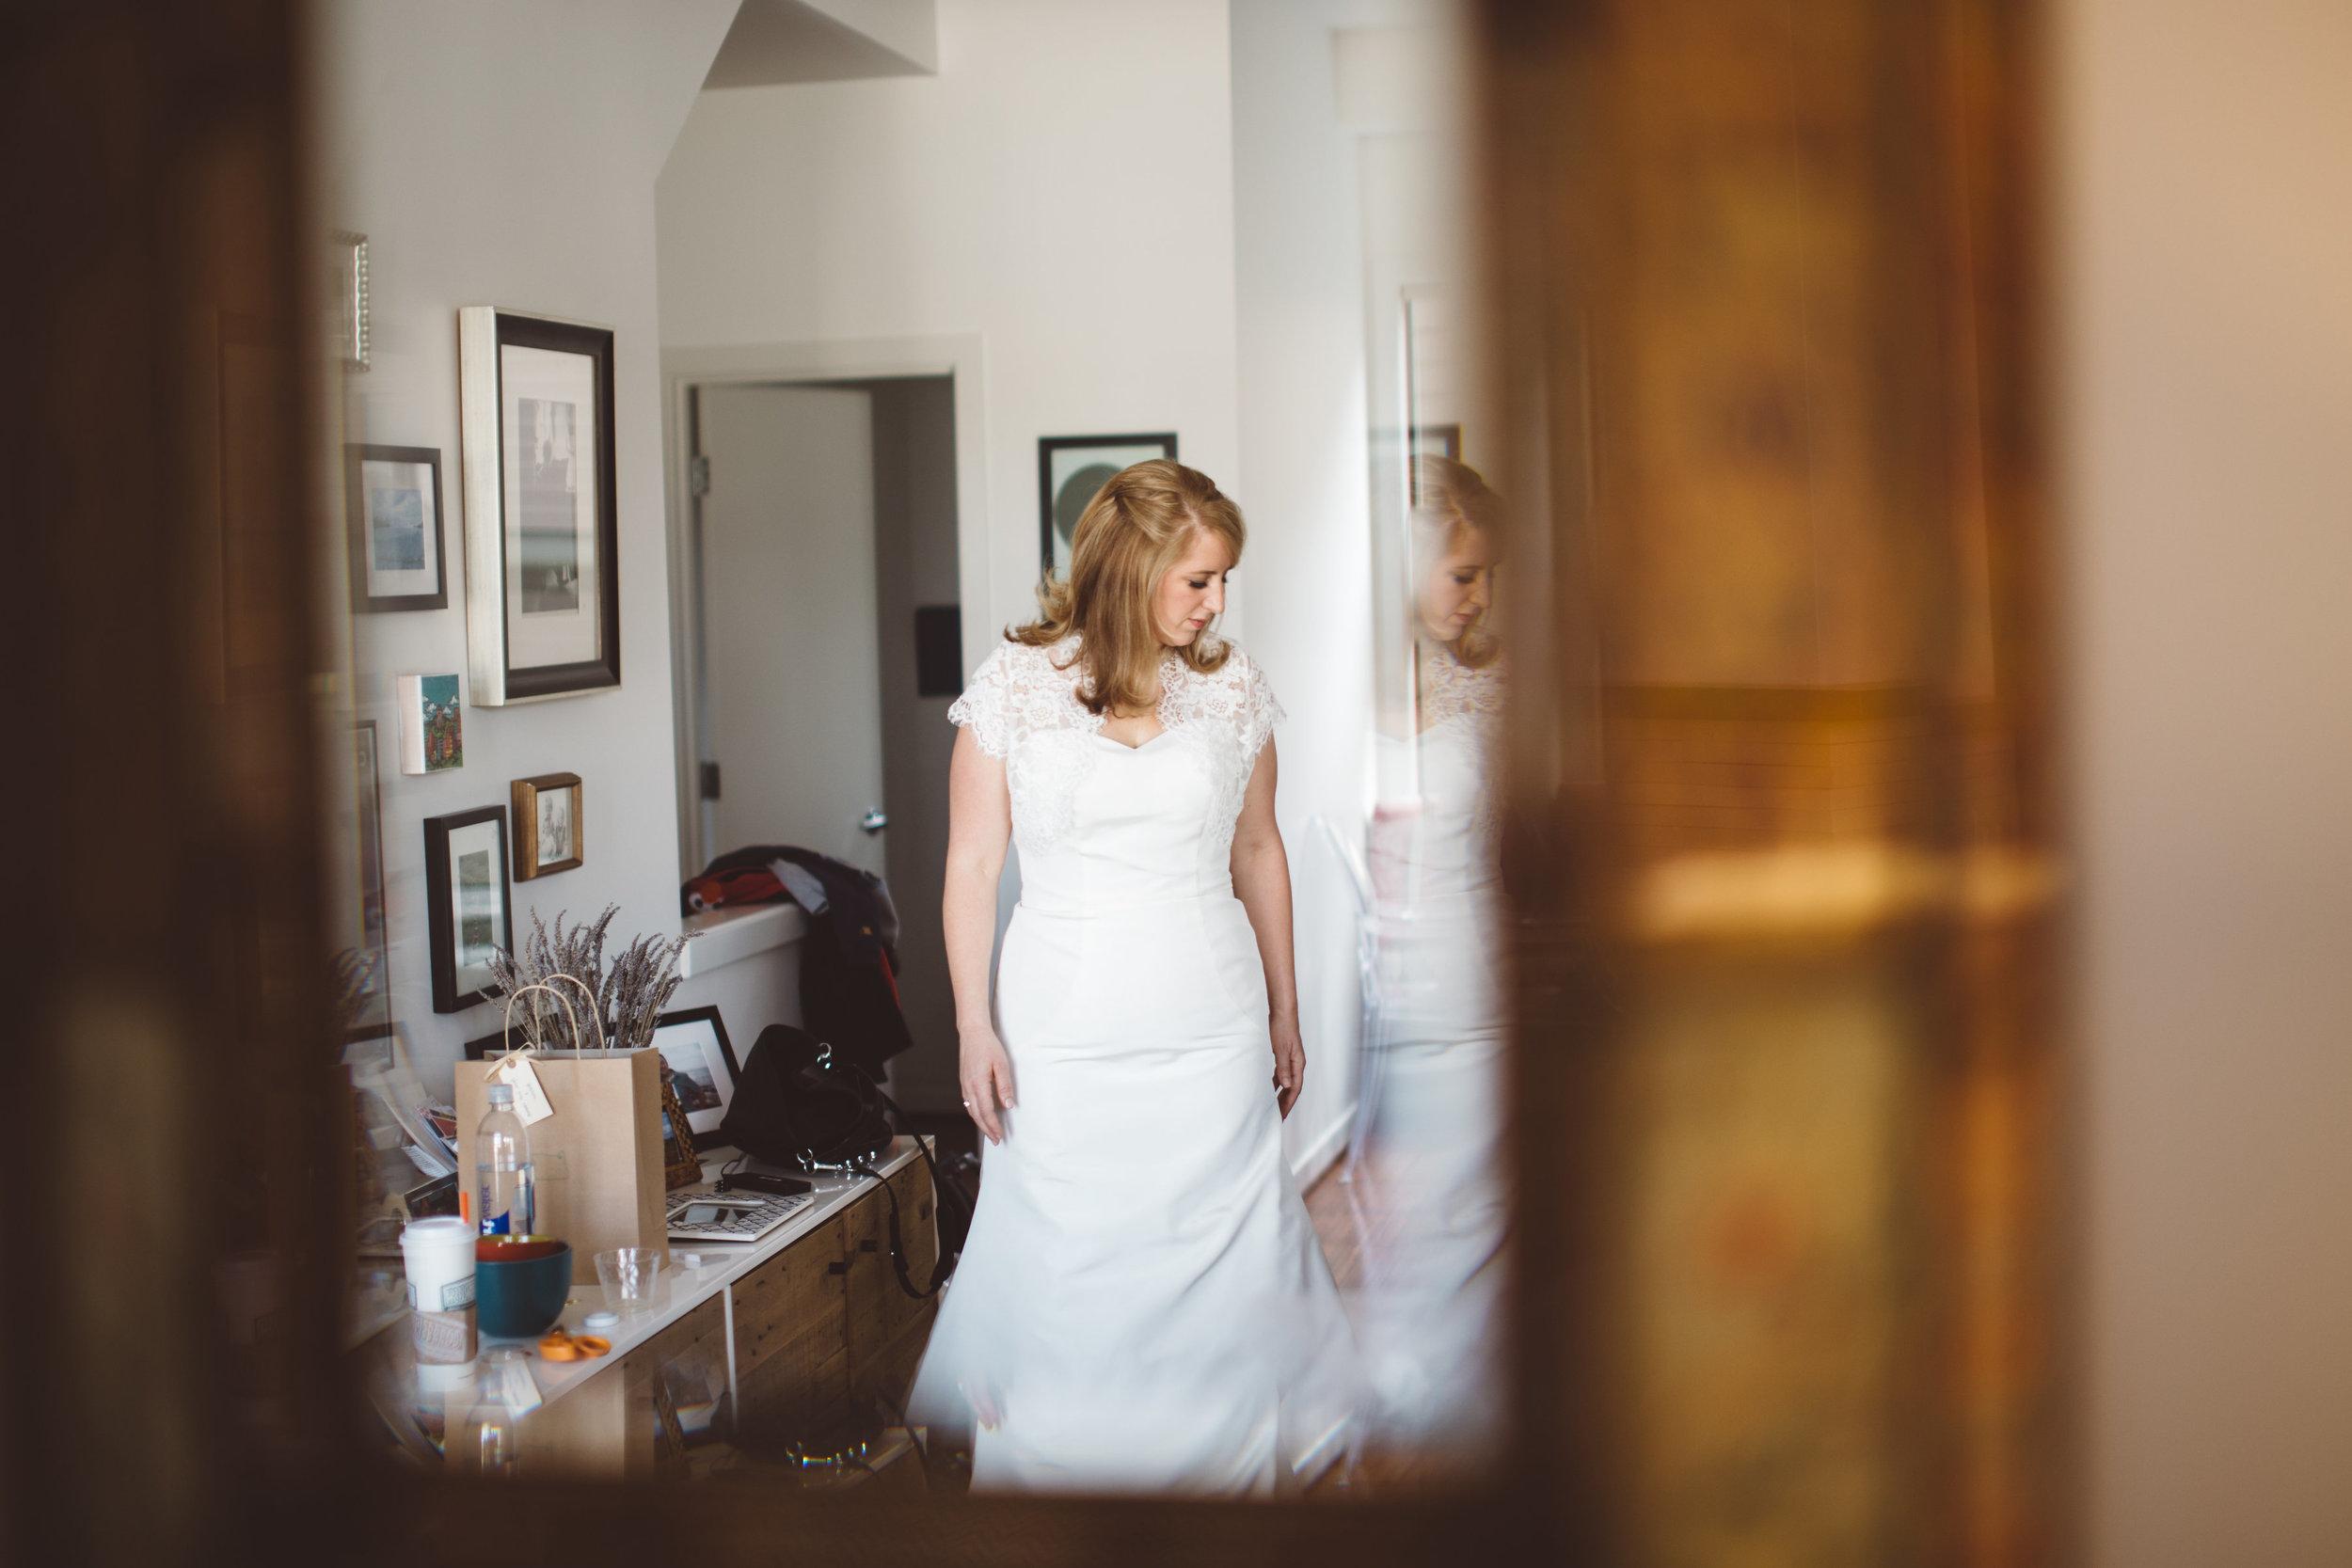 Bridalbliss.com | Portland Wedding | Oregon Event Planning and Design | Bryan Rupp Photography